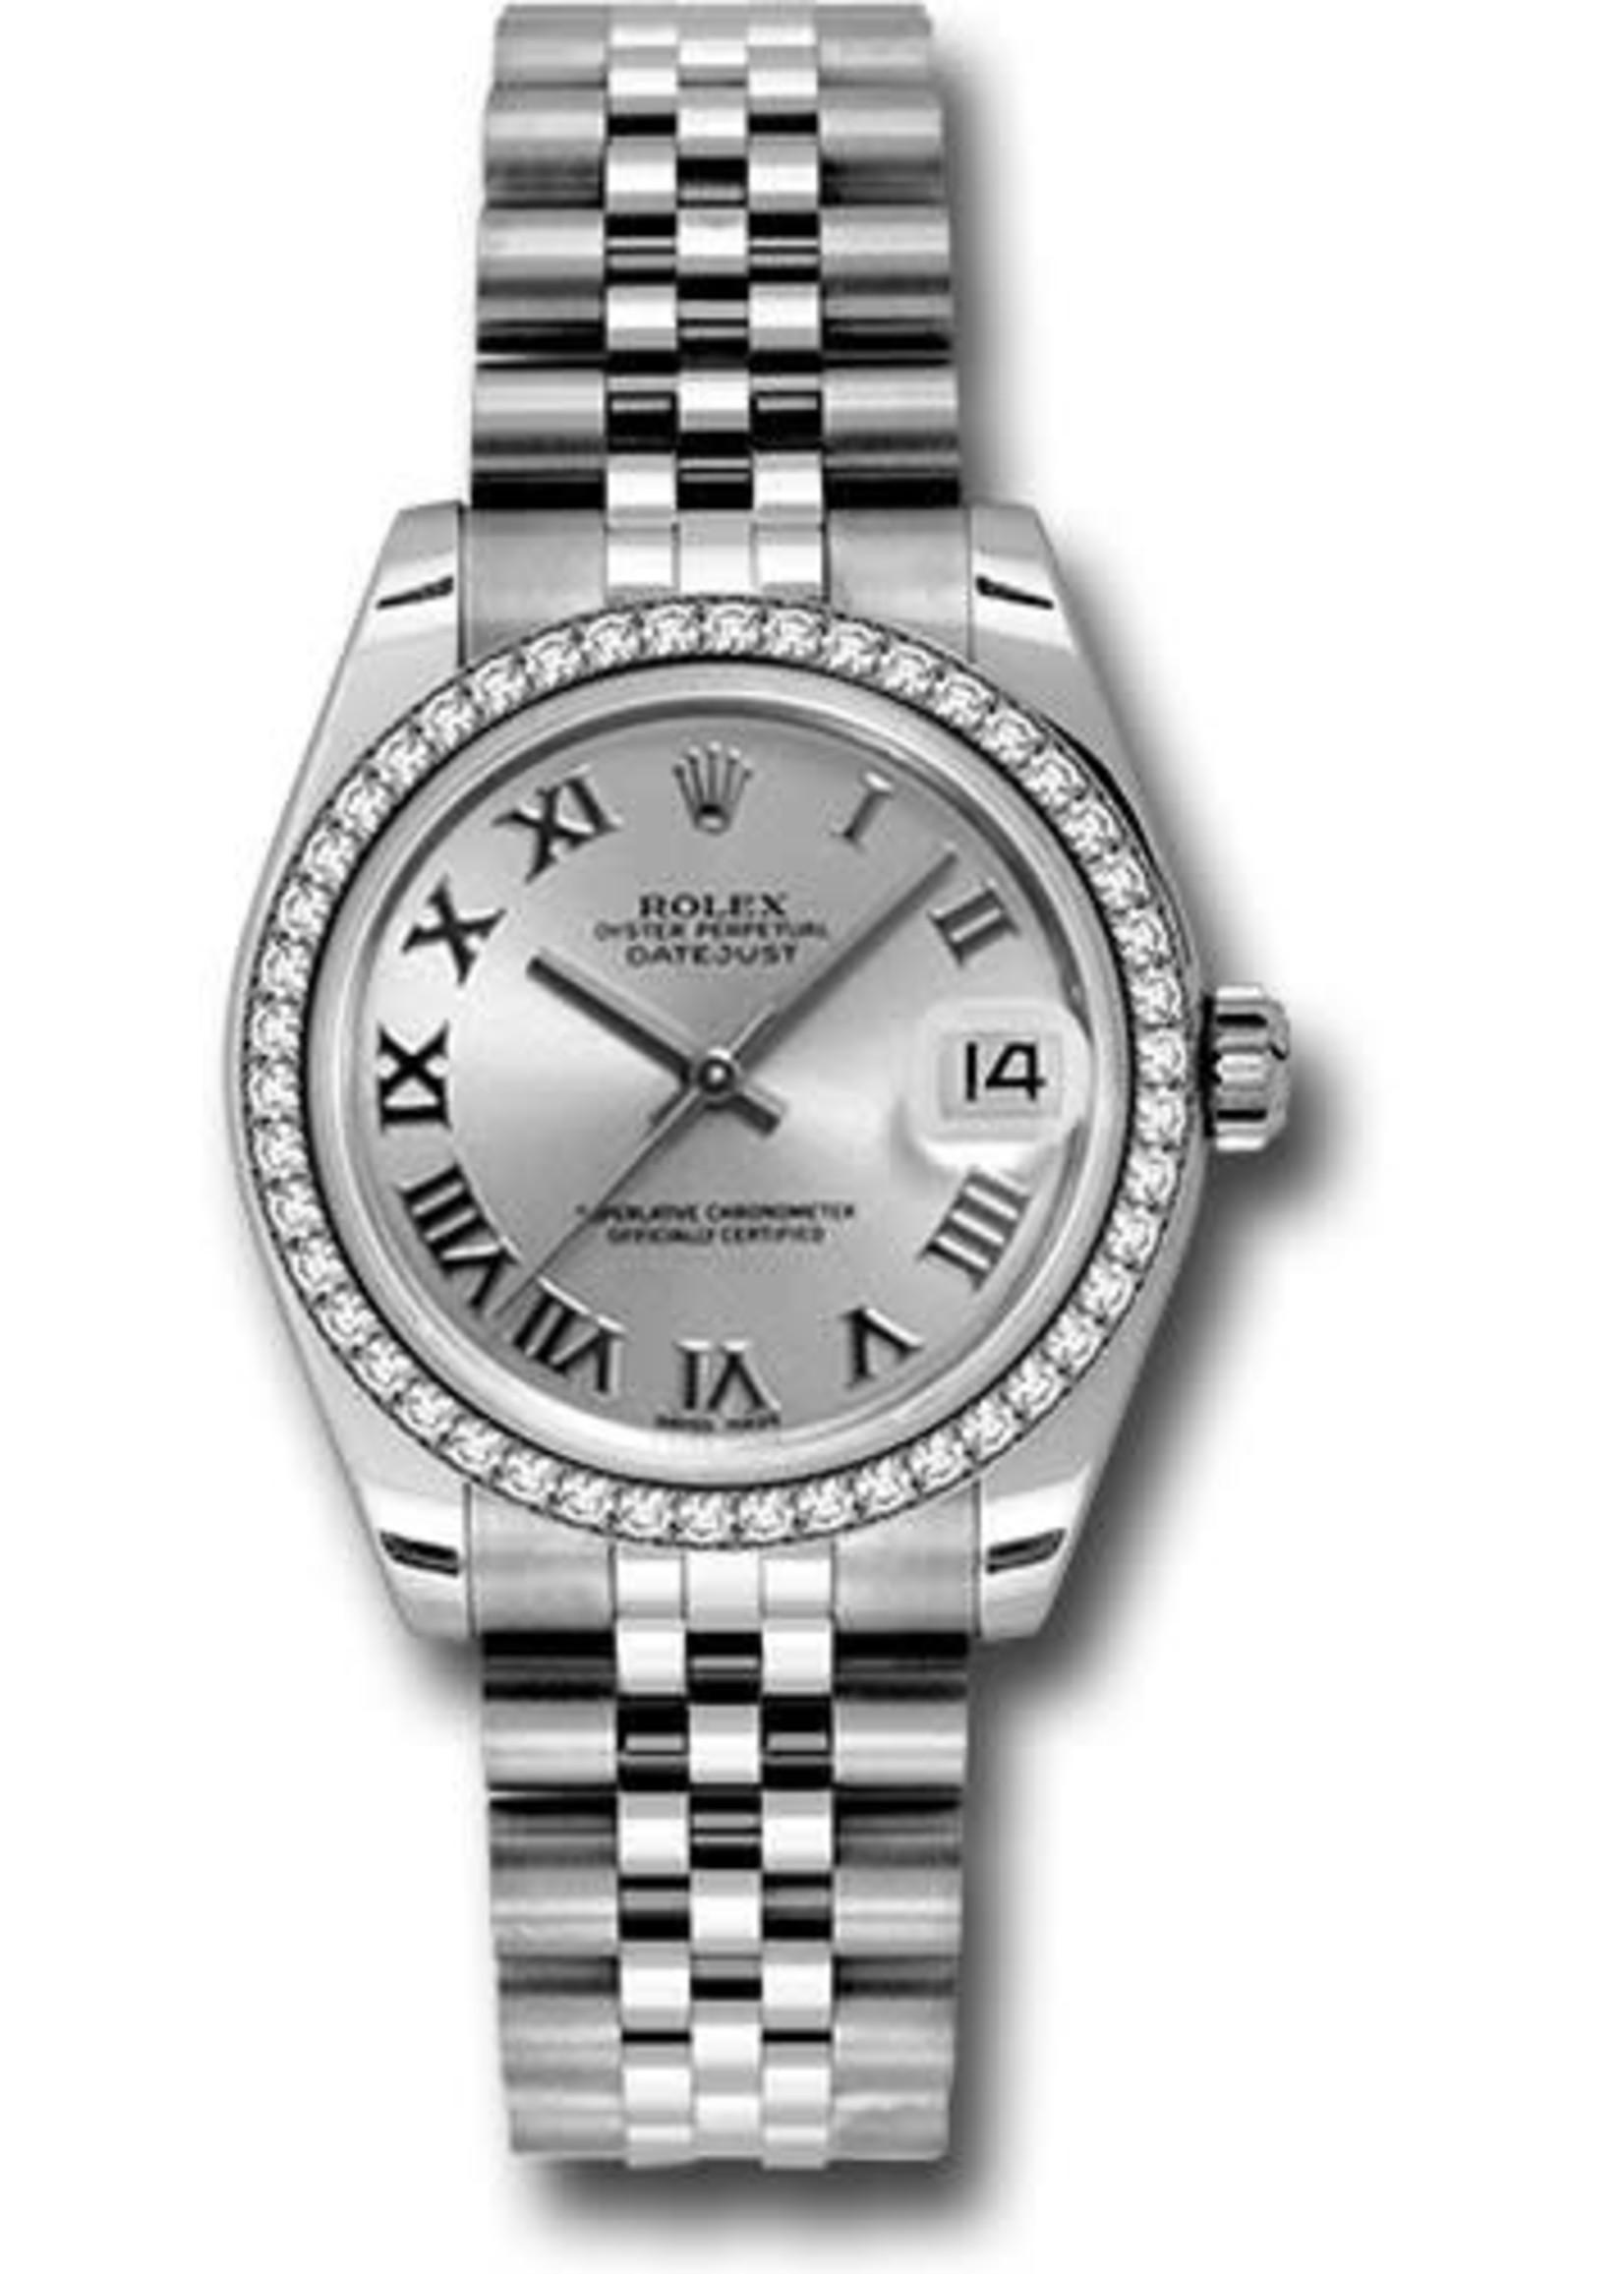 Rolex ROLEX DATEJUST  31MM #178384 (2011 B+P) BRAND NEW NEVER WORN